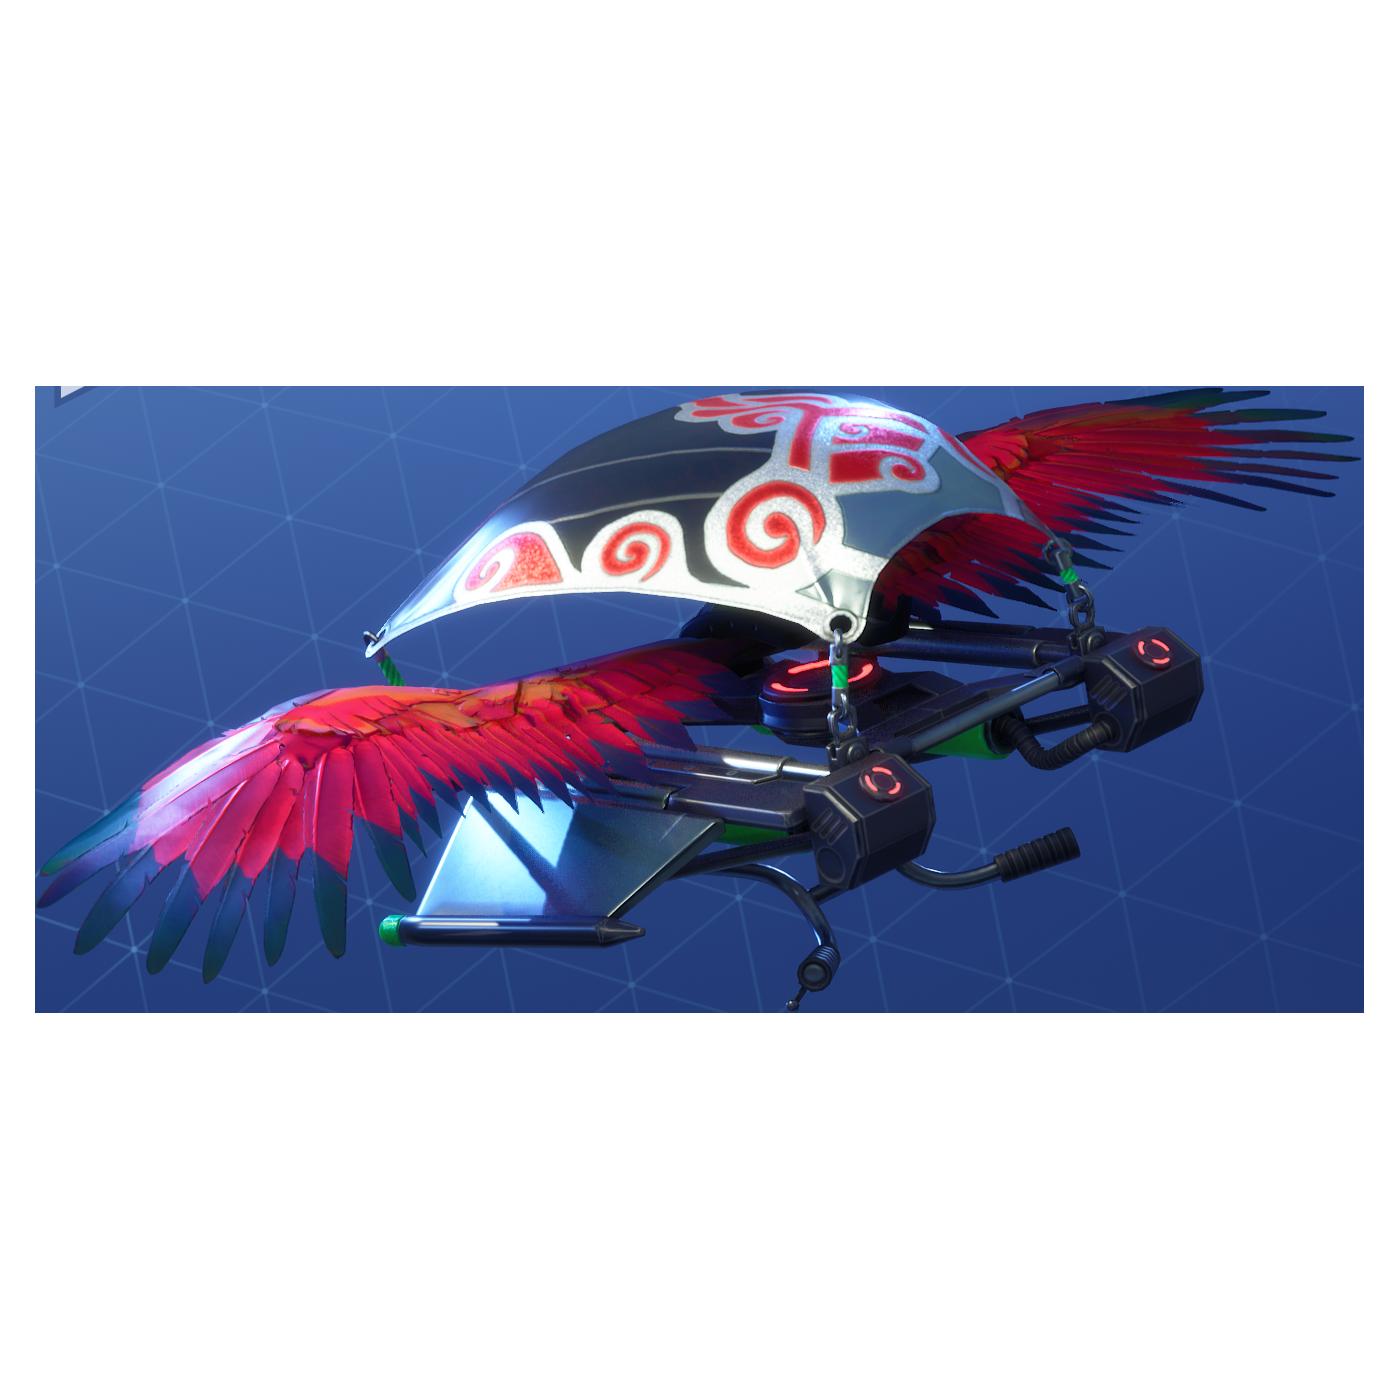 Fortnite Glider Fortnite Gears Of War 3 Game Artwork